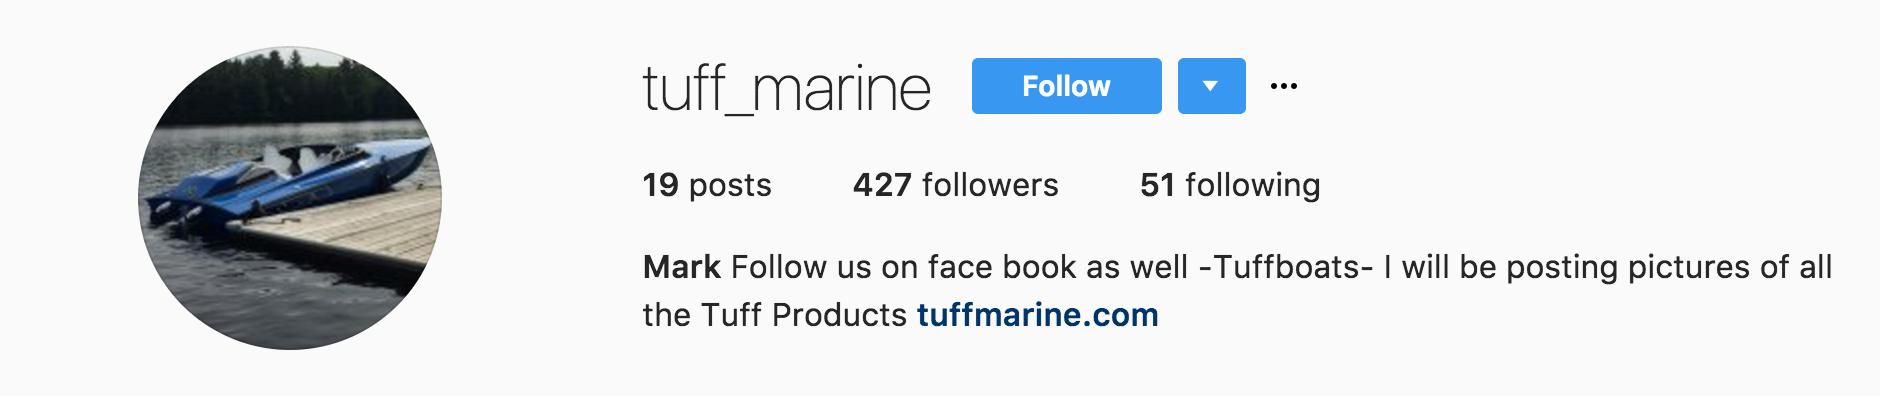 Tuff Marine Instagram